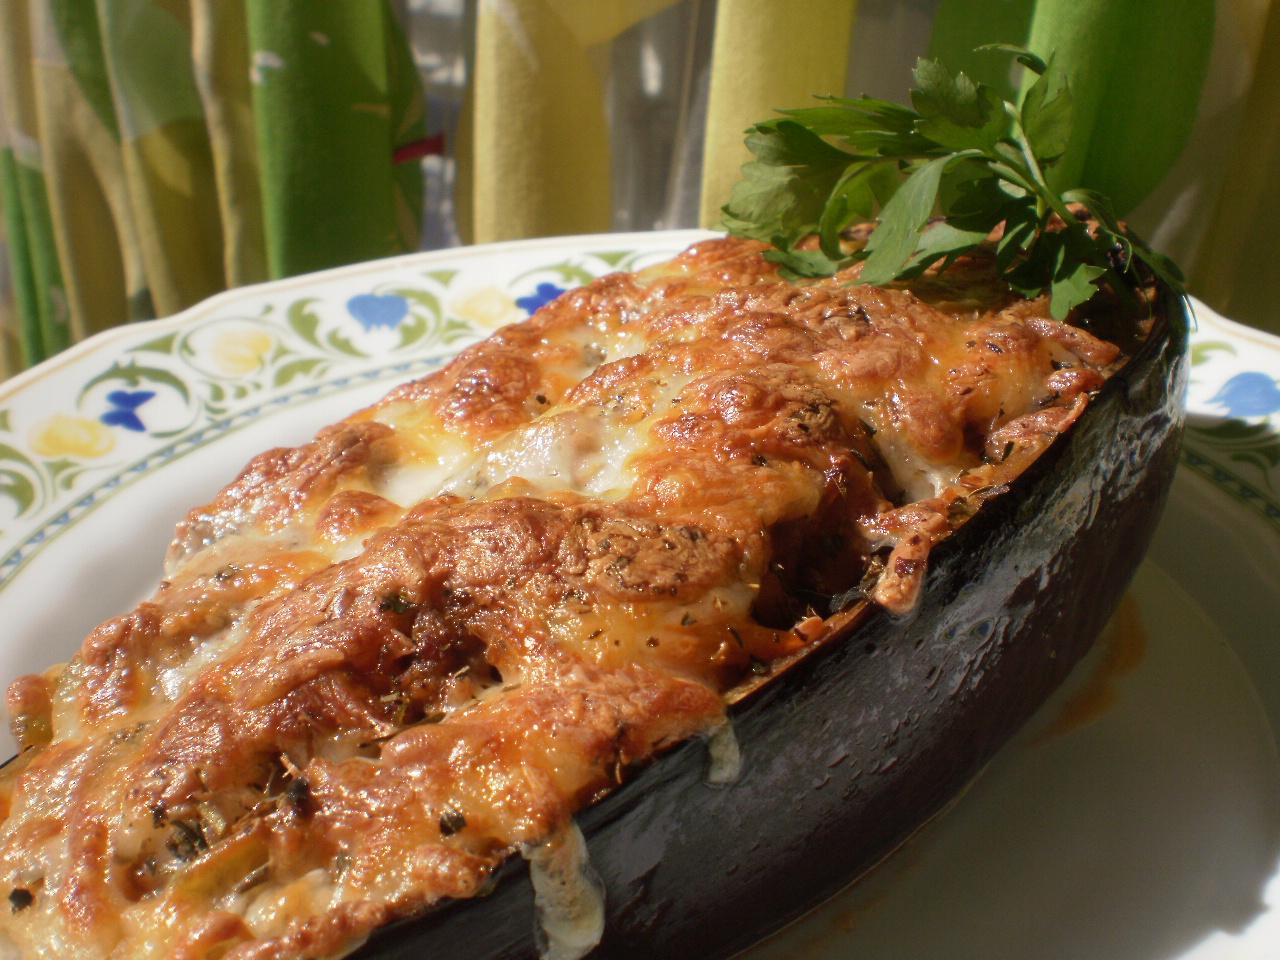 Mi cocina berenjenas rellenas a la turca for Cocina berenjenas rellenas